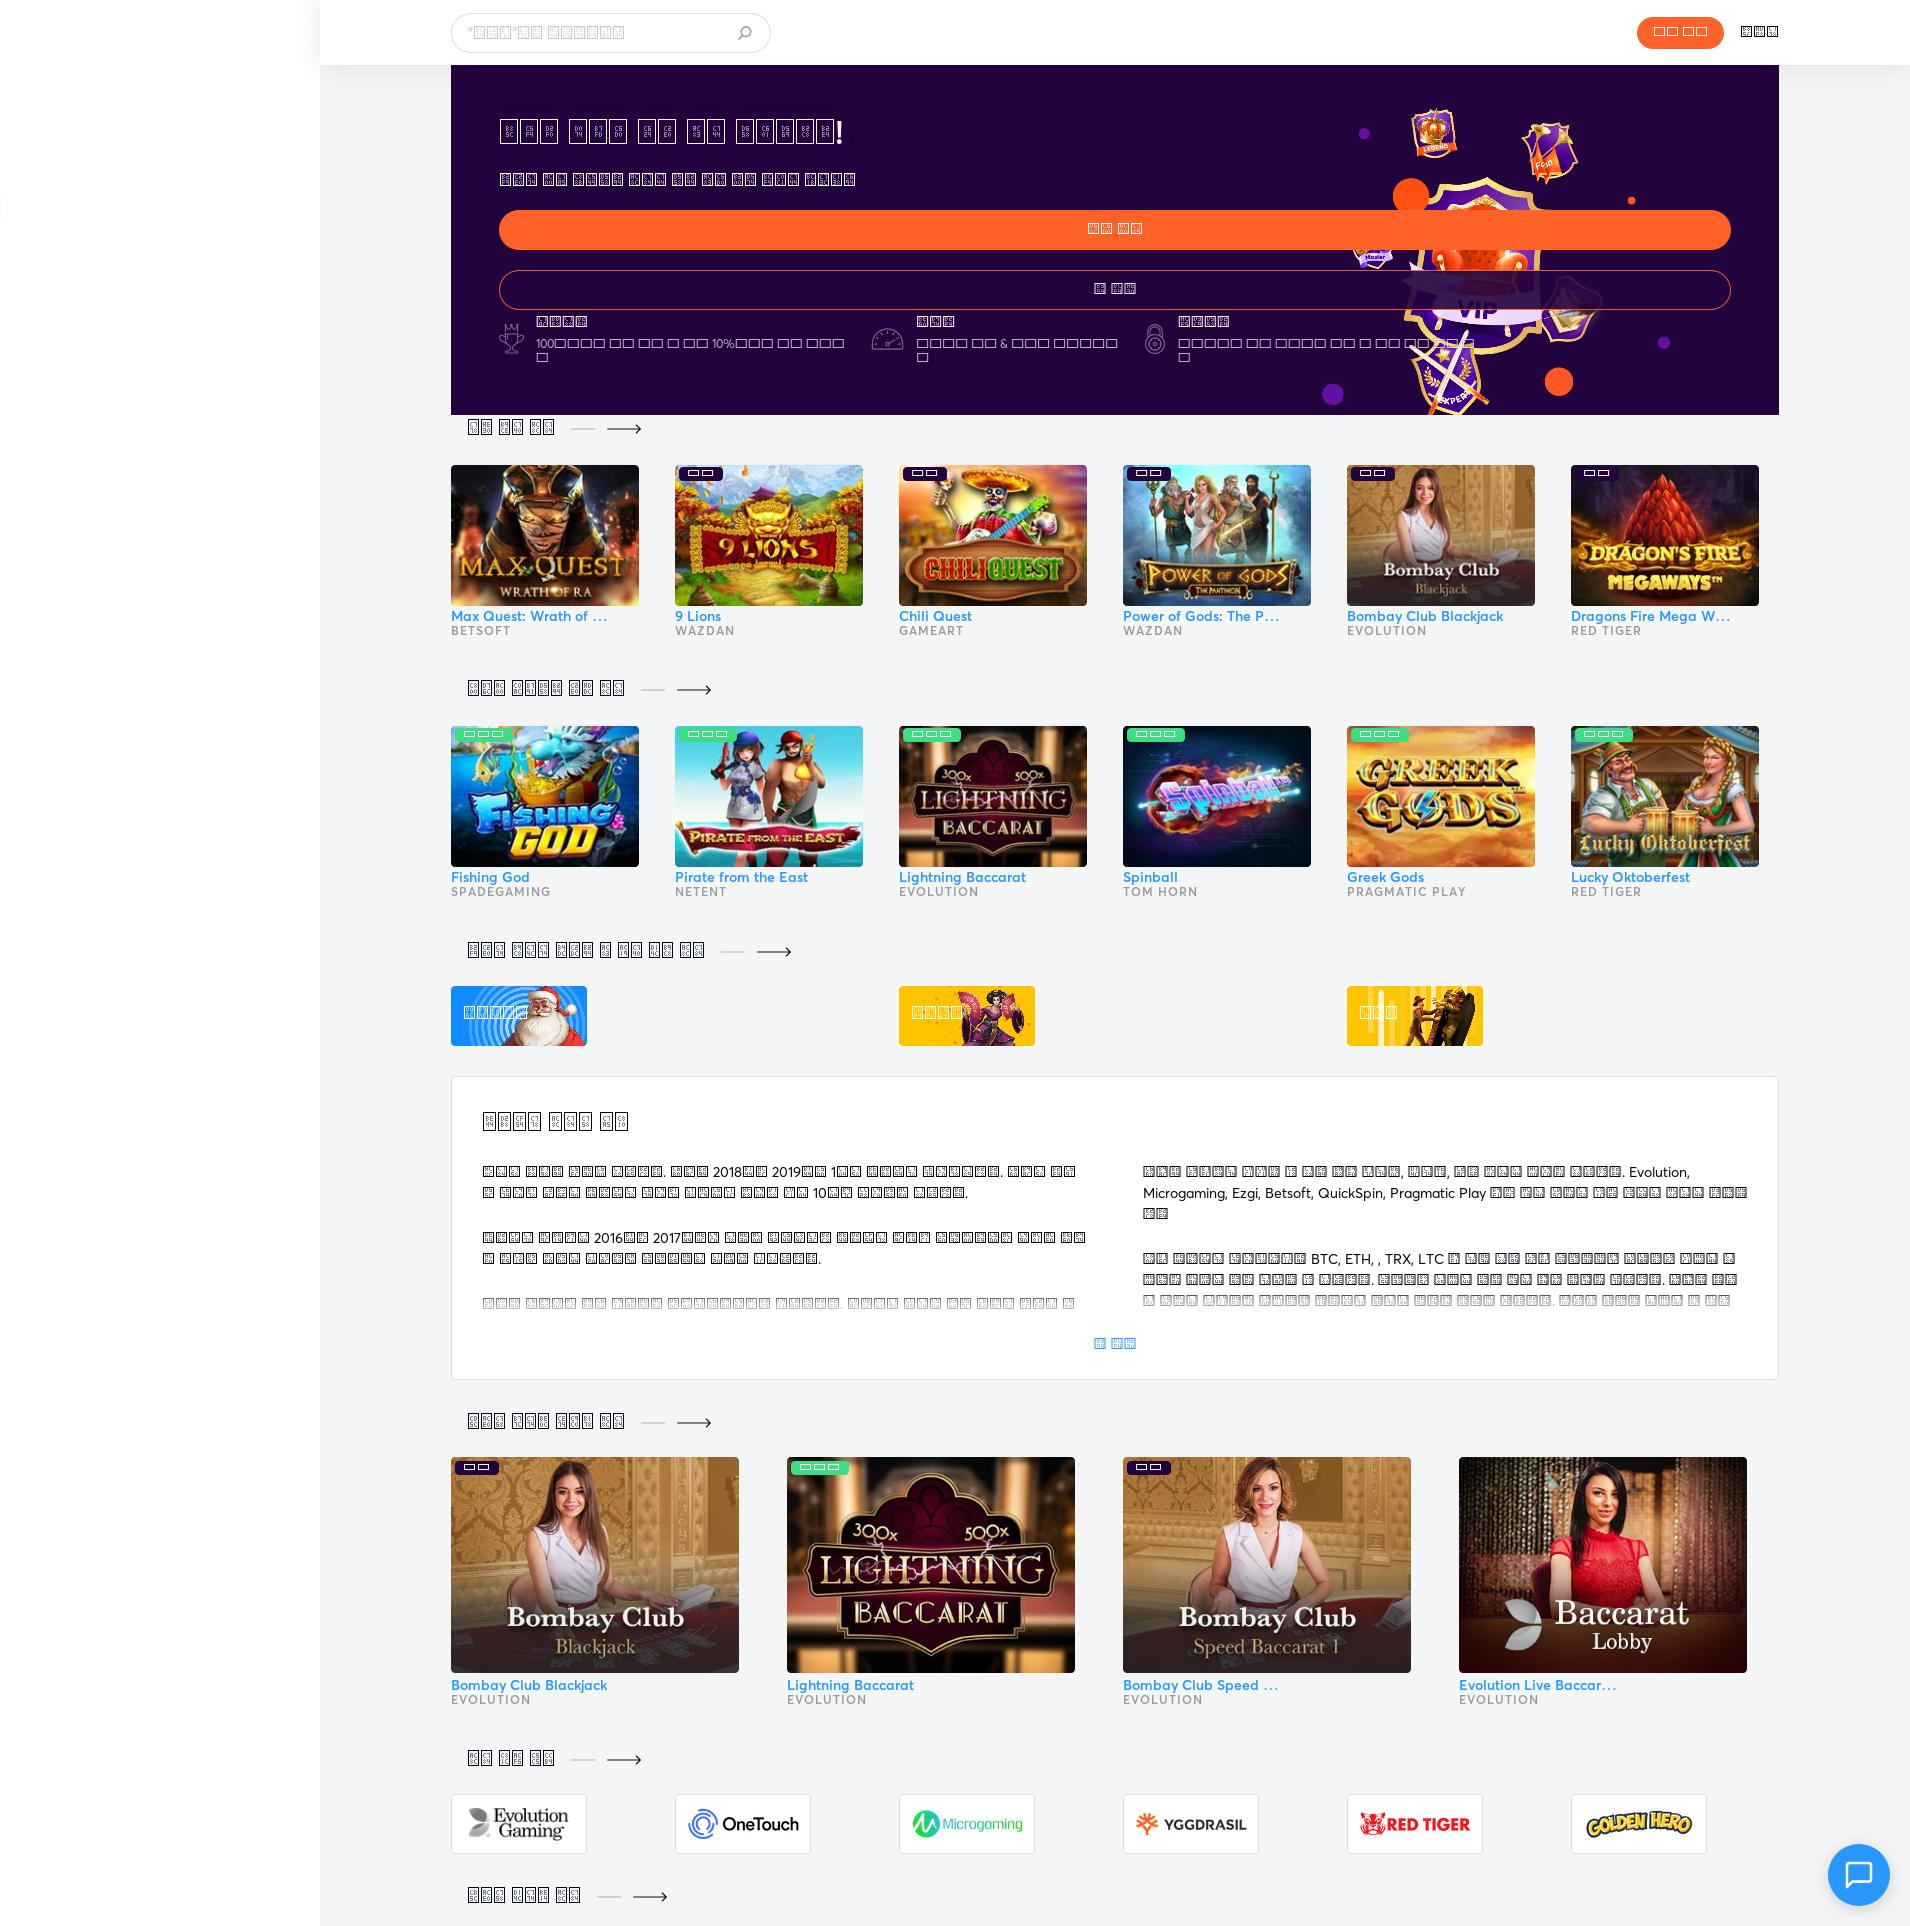 Casino screen Lobby 2019-12-13 for Korea, Republic of